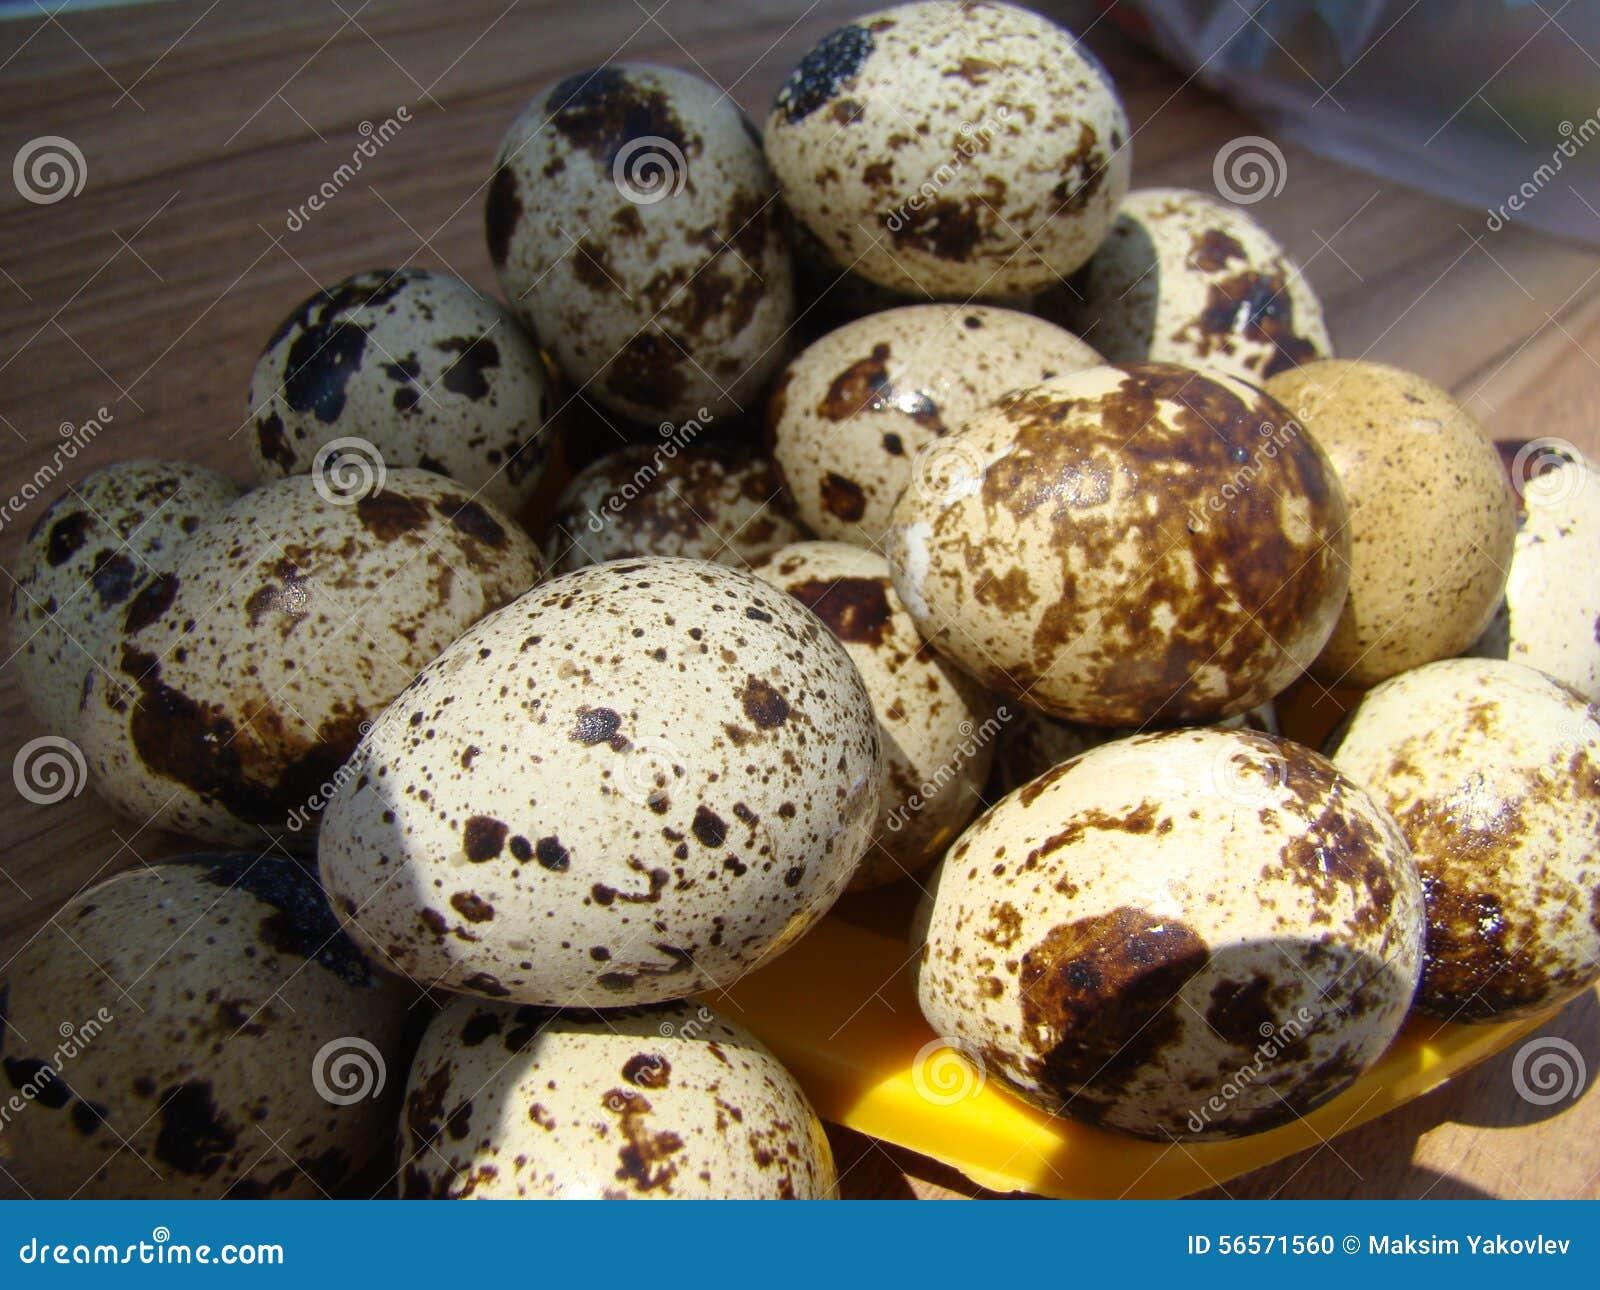 Download σαν αυγά ανασκόπησης πολλές νησοπέρδικες Στοκ Εικόνες - εικόνα από χρώμα, ακατέργαστος: 56571560